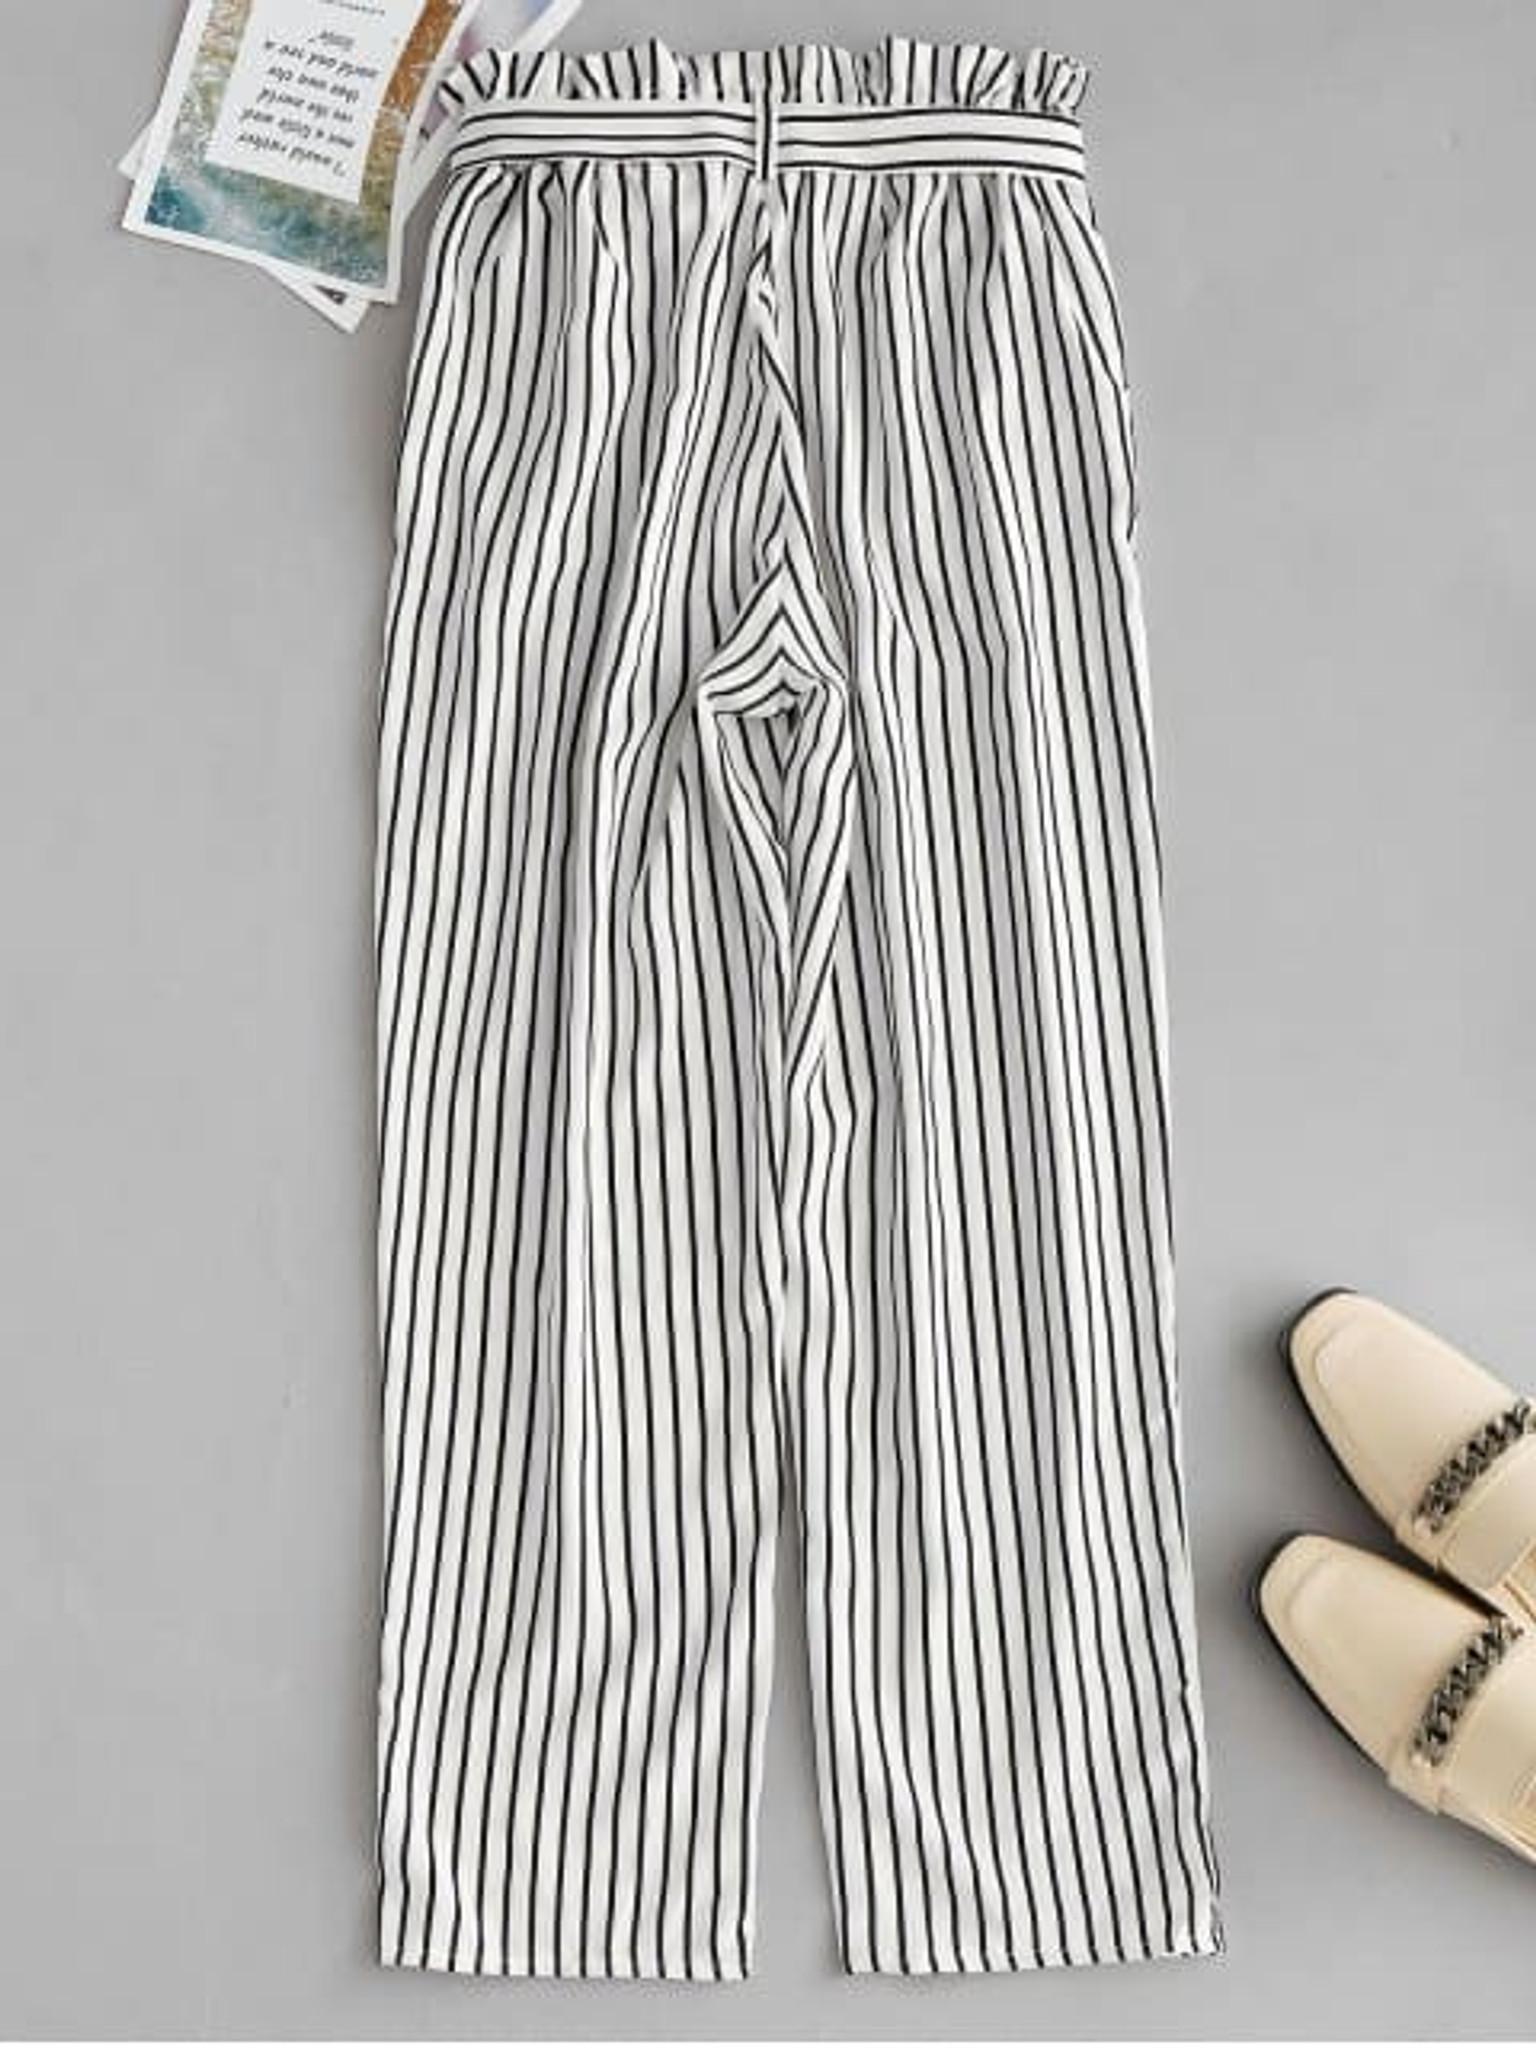 Fifth Avenue Womens NIPT Tie Waist Striped Cotton Pants - White